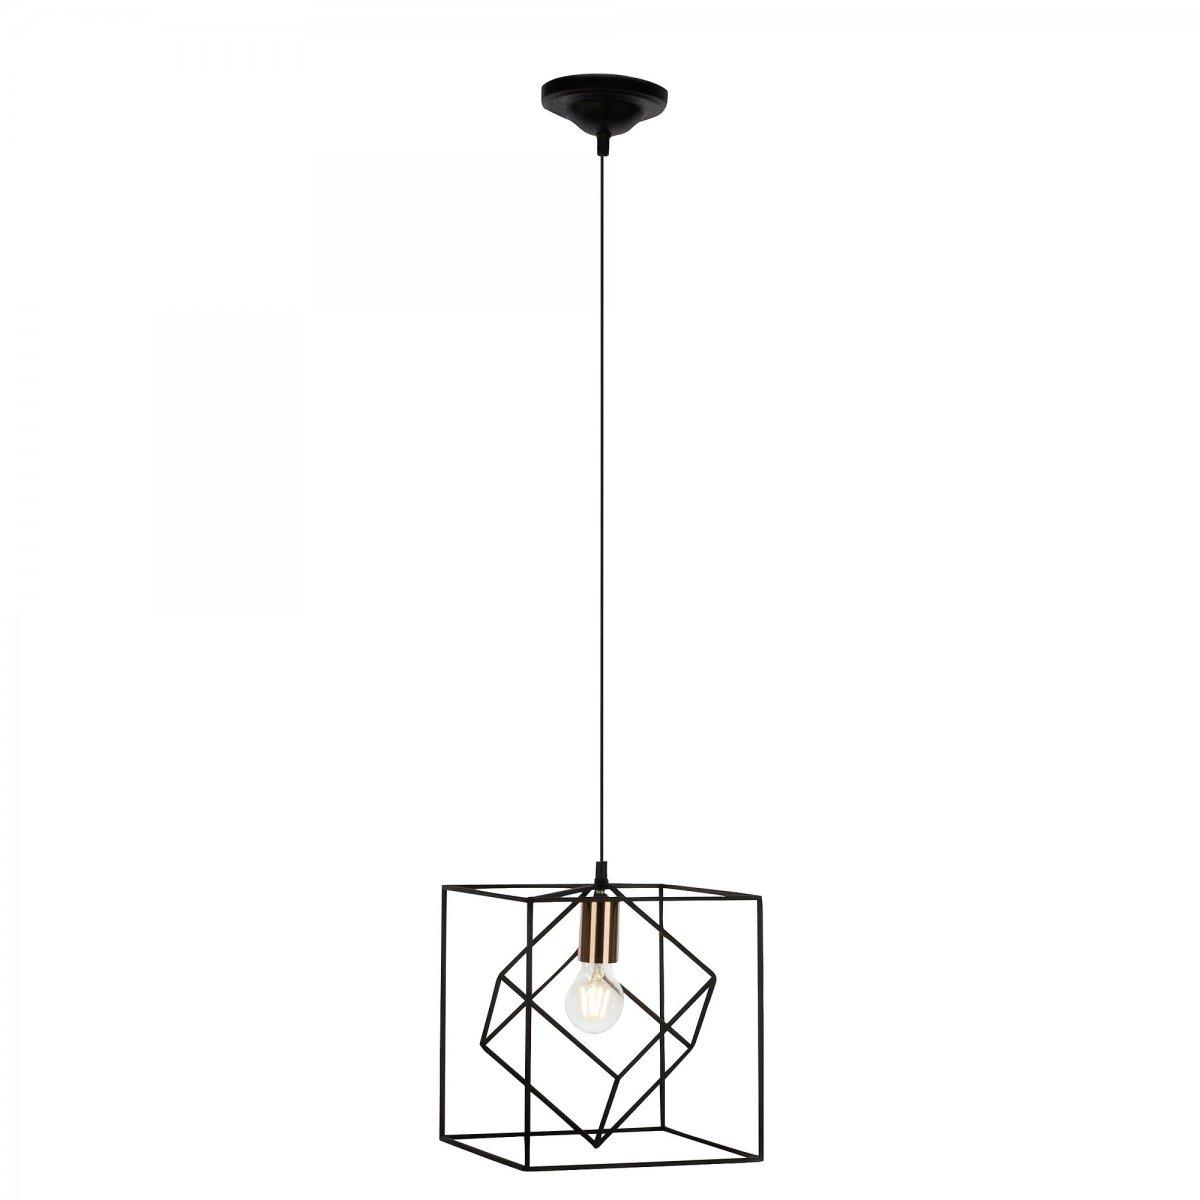 brilliant leuchten no 93594 76 pendelleuchte tycho 1 flammig schwarz kupfer eur 42 06. Black Bedroom Furniture Sets. Home Design Ideas